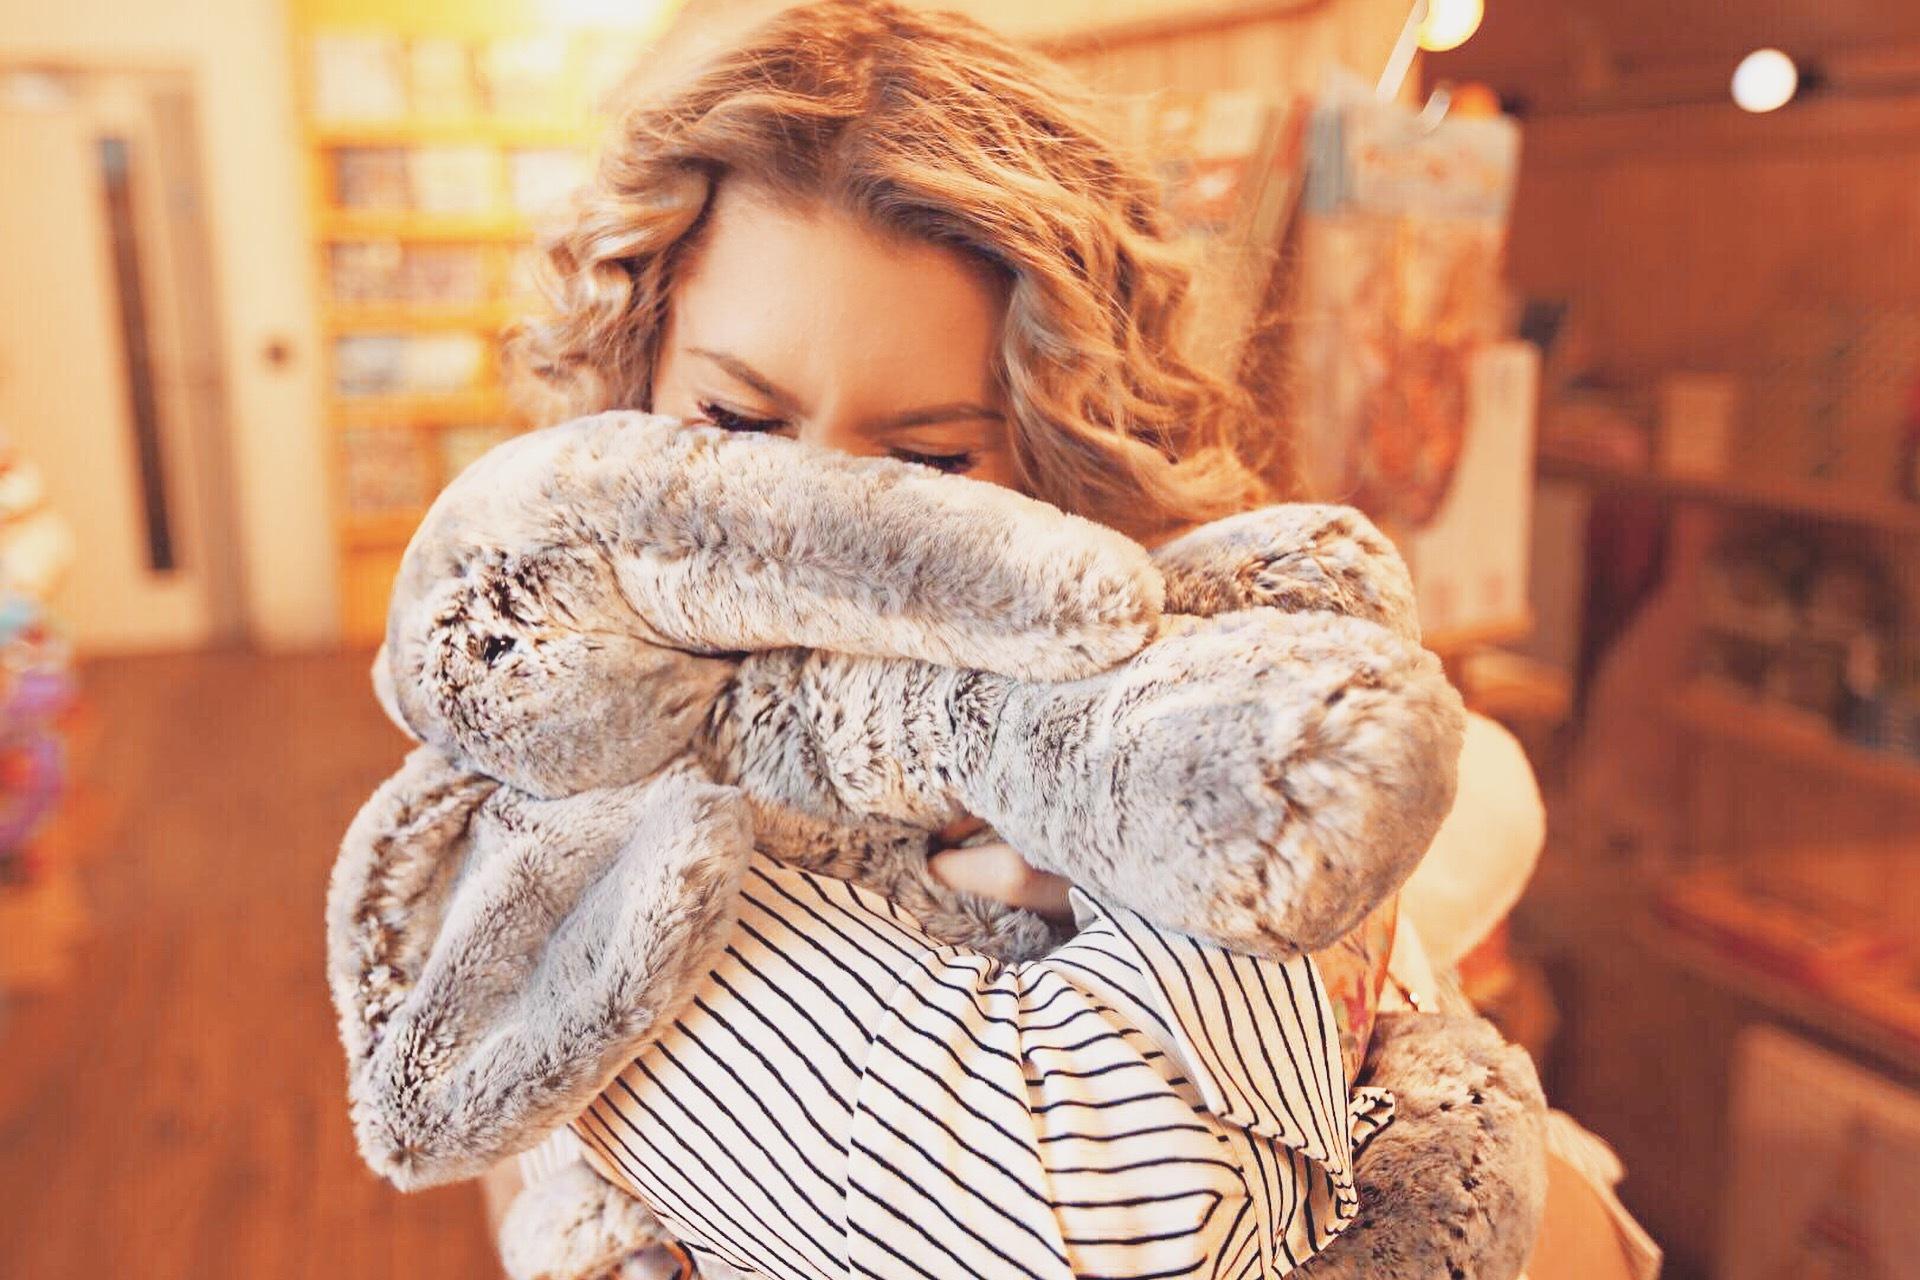 Comfort by DesireeLaforest